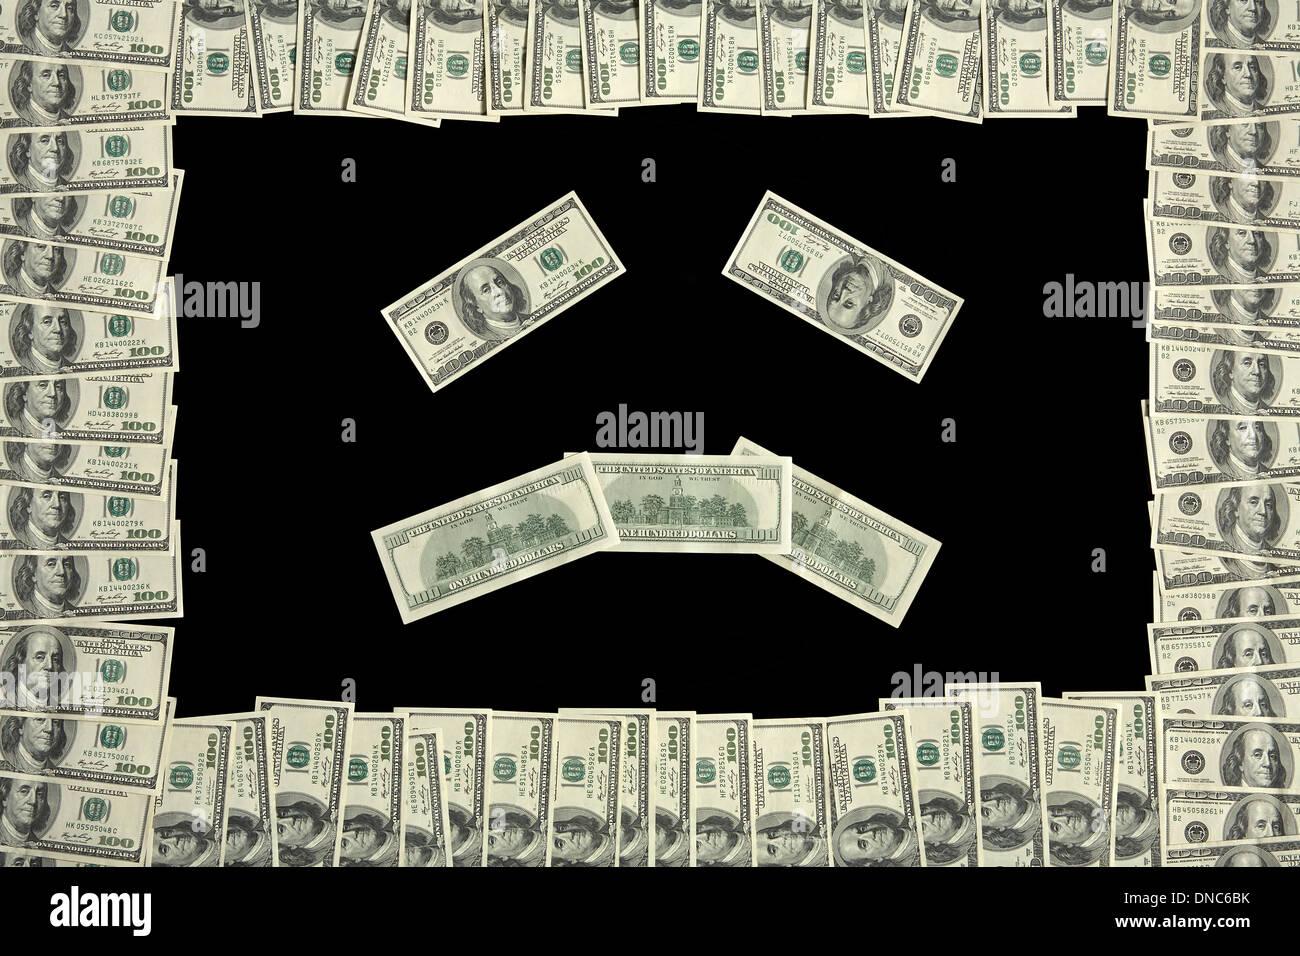 Cara triste en Dollar Bill frame Imagen De Stock